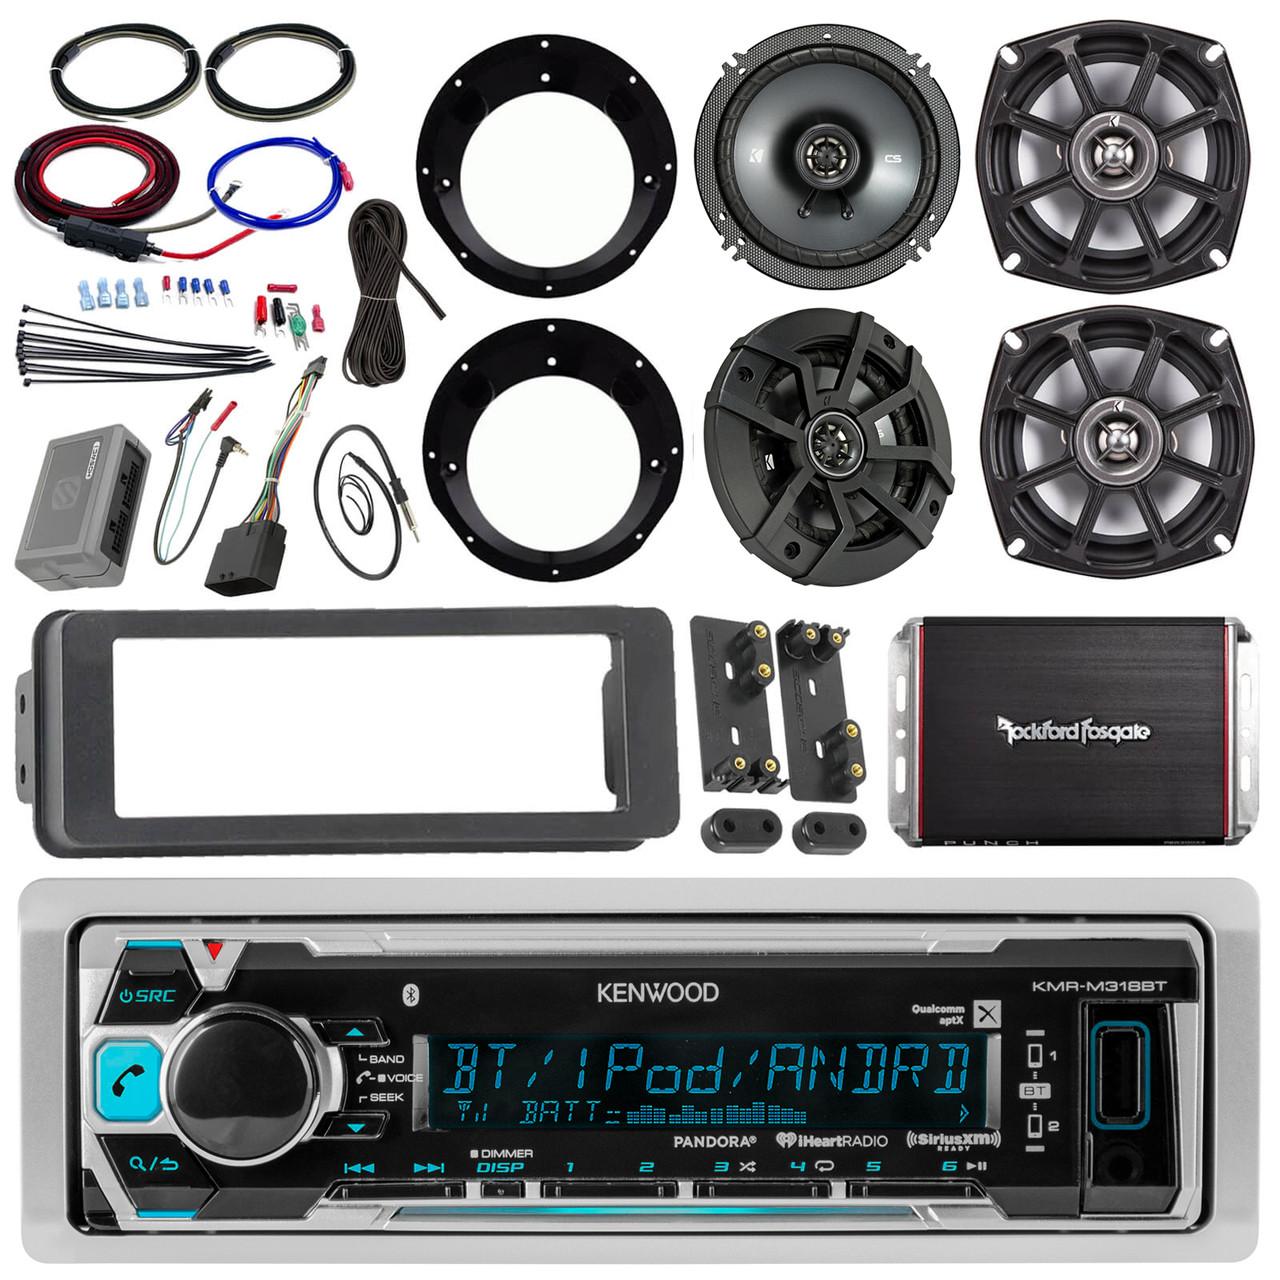 kenwood kmrm318bt stereo receiver bundle 2x kicker 6 5 speaker 2 wiring diagram moreover 2 channel 4 ohm speakers wiring on 12 kenwood [ 1280 x 1280 Pixel ]